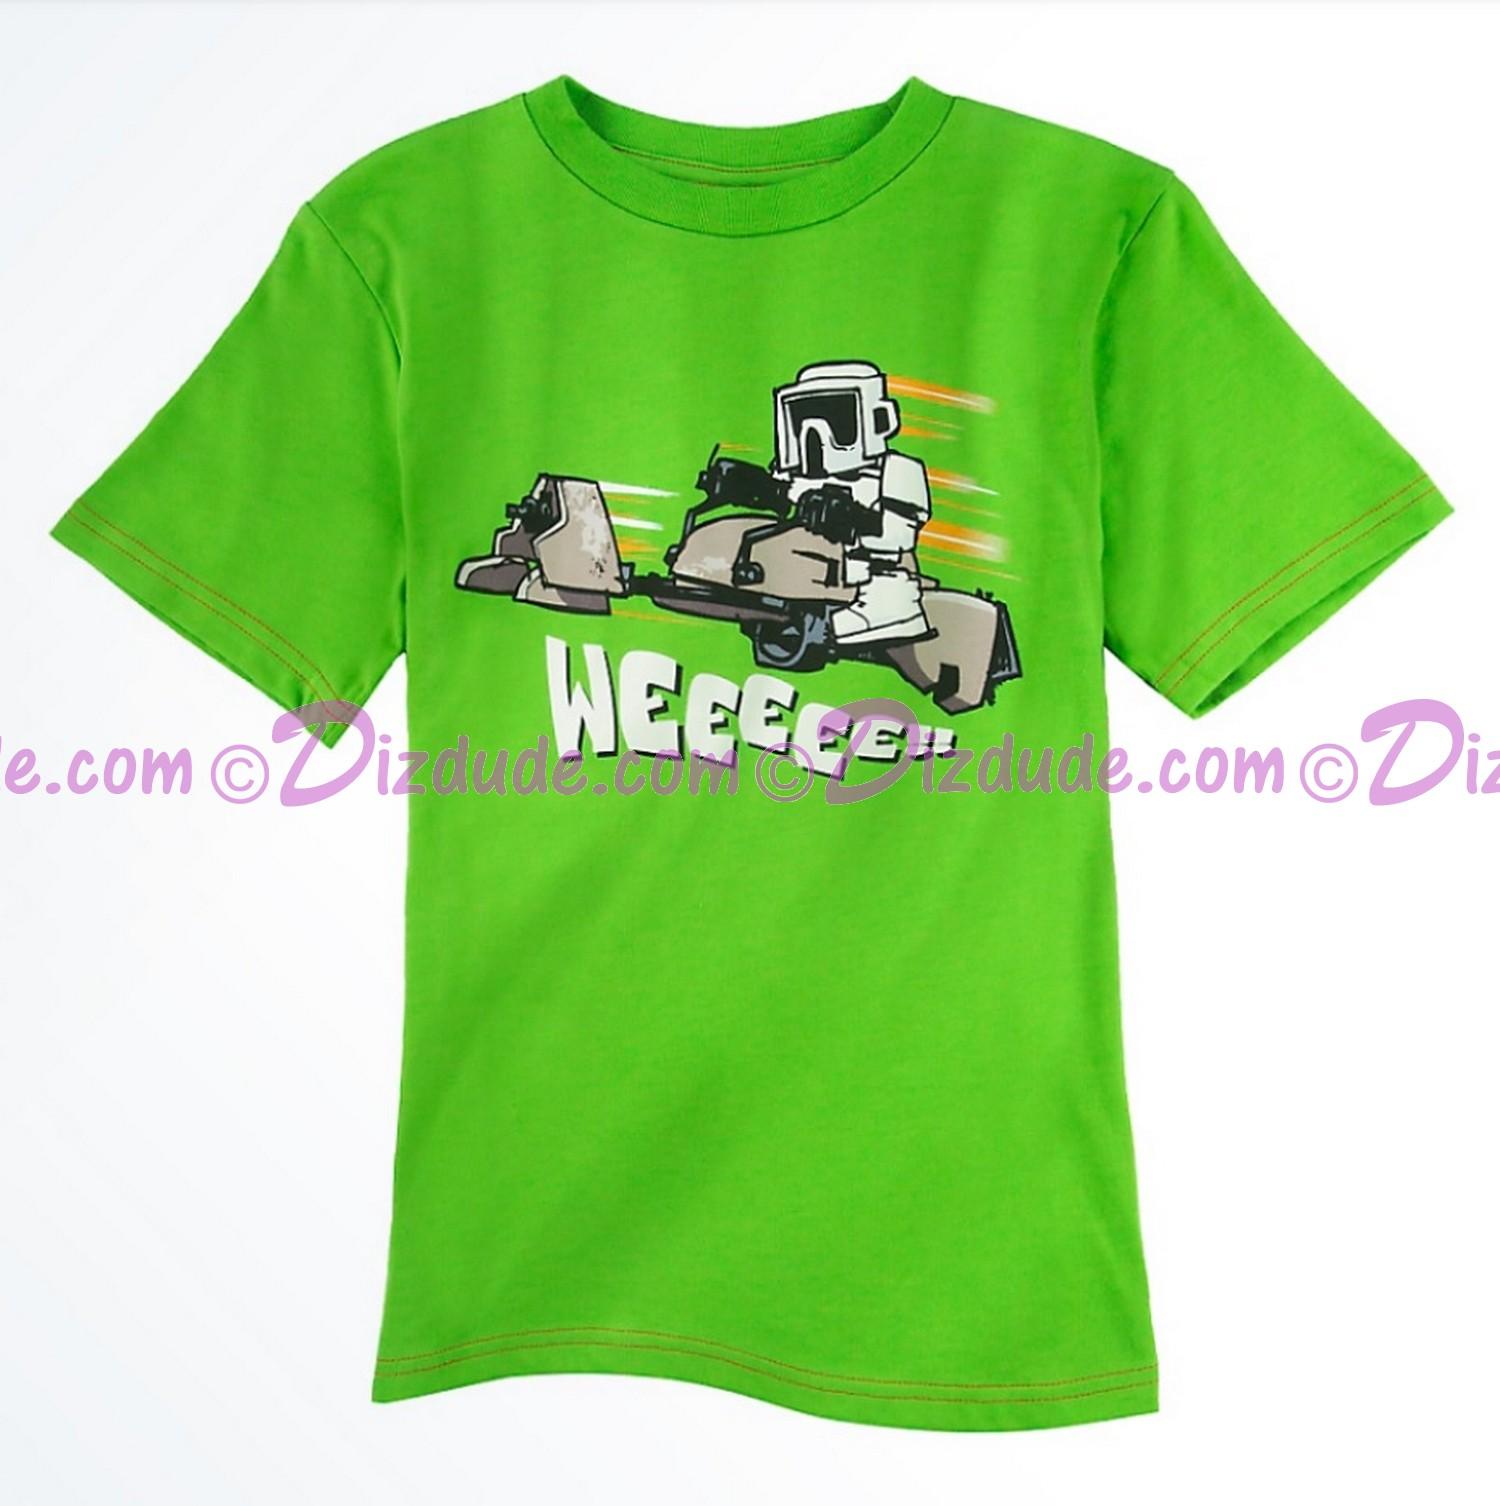 Biker Scout Weee Youth T-shirt  (Tee, Tshirt or T shirt) - Disney Star Wars © Dizdude.com